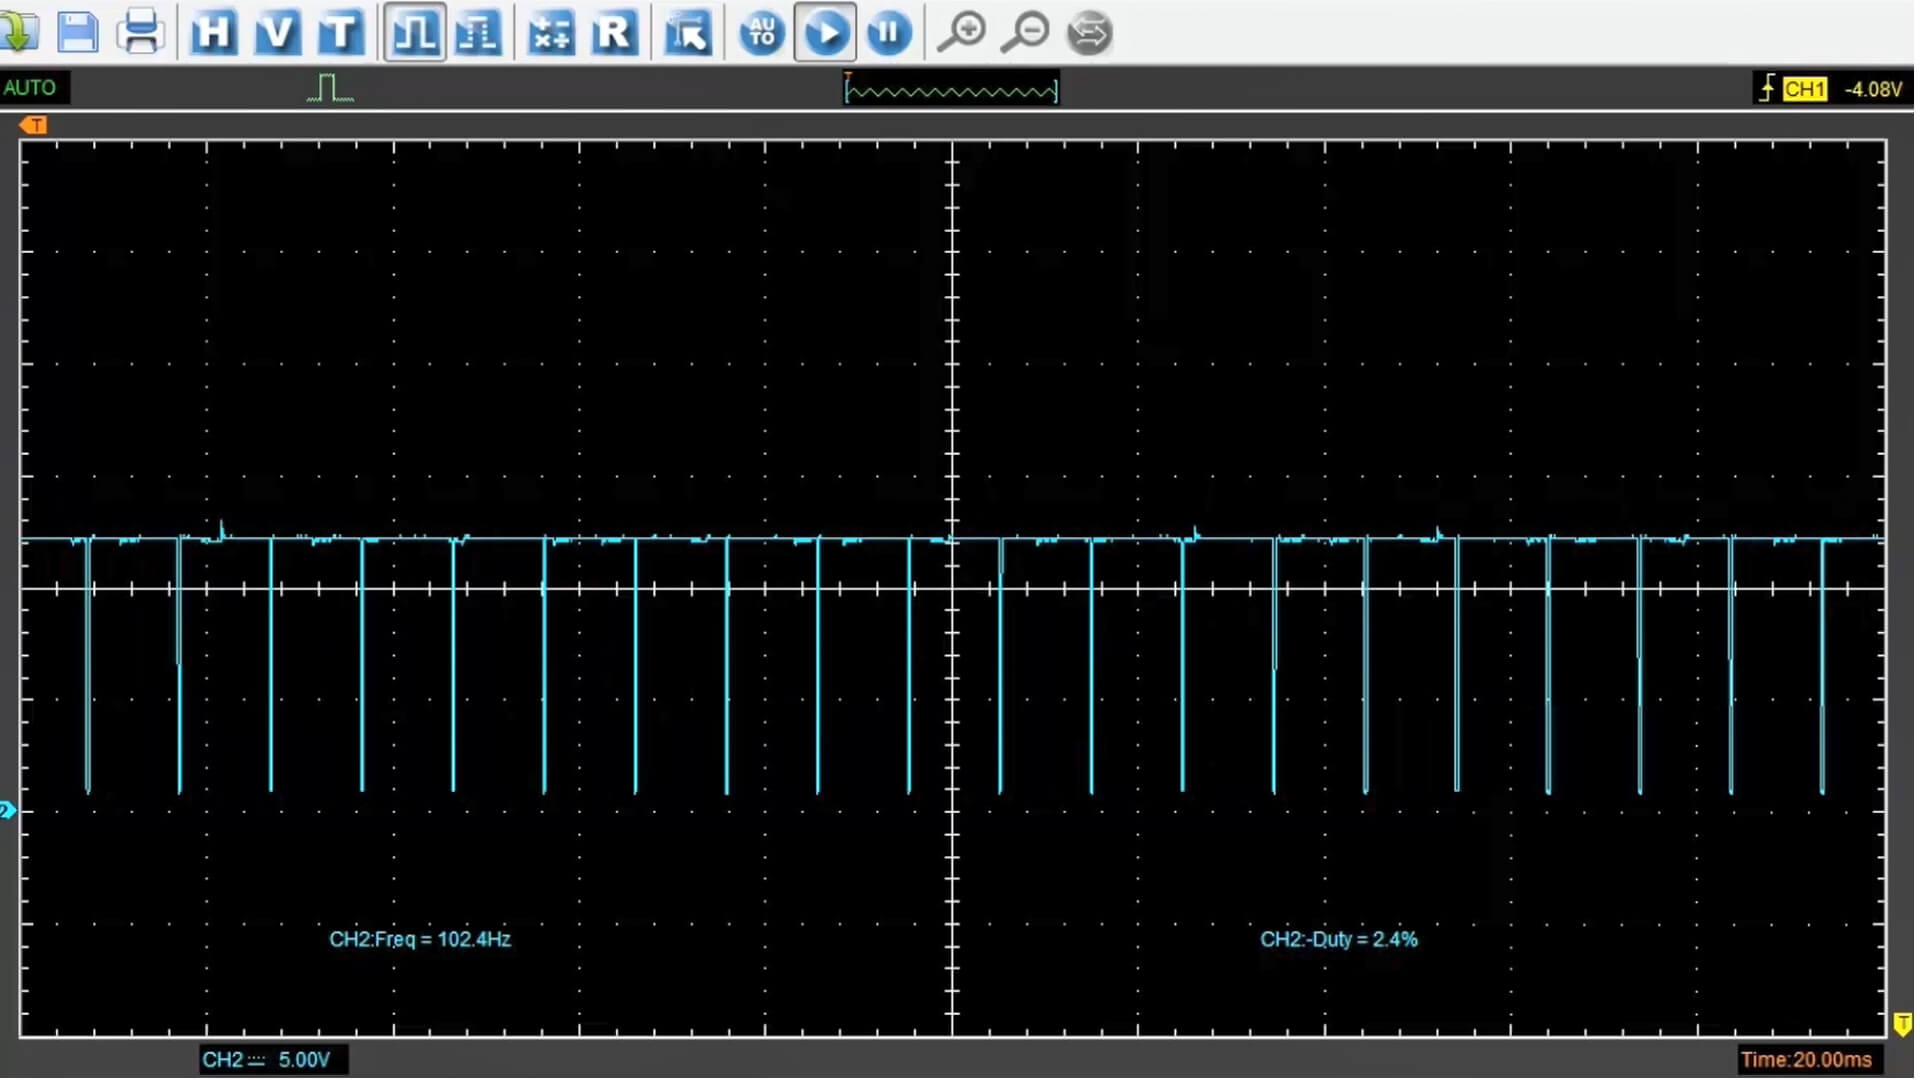 sonda-lambda-banda-larga-teste-controle-aquecedor-1